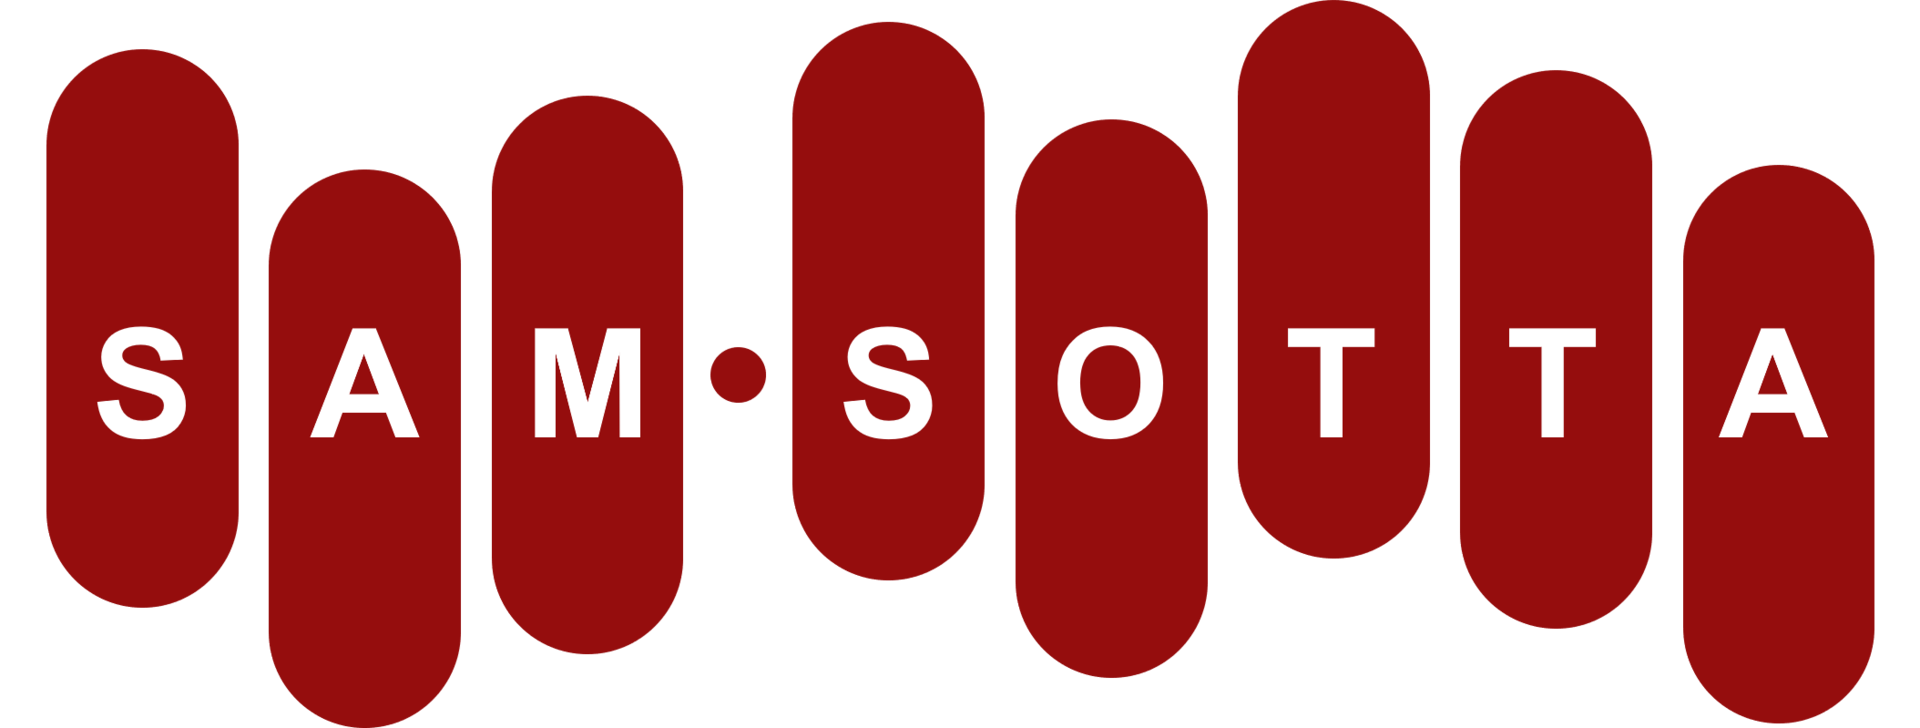 Tailored & Customized Program/Module